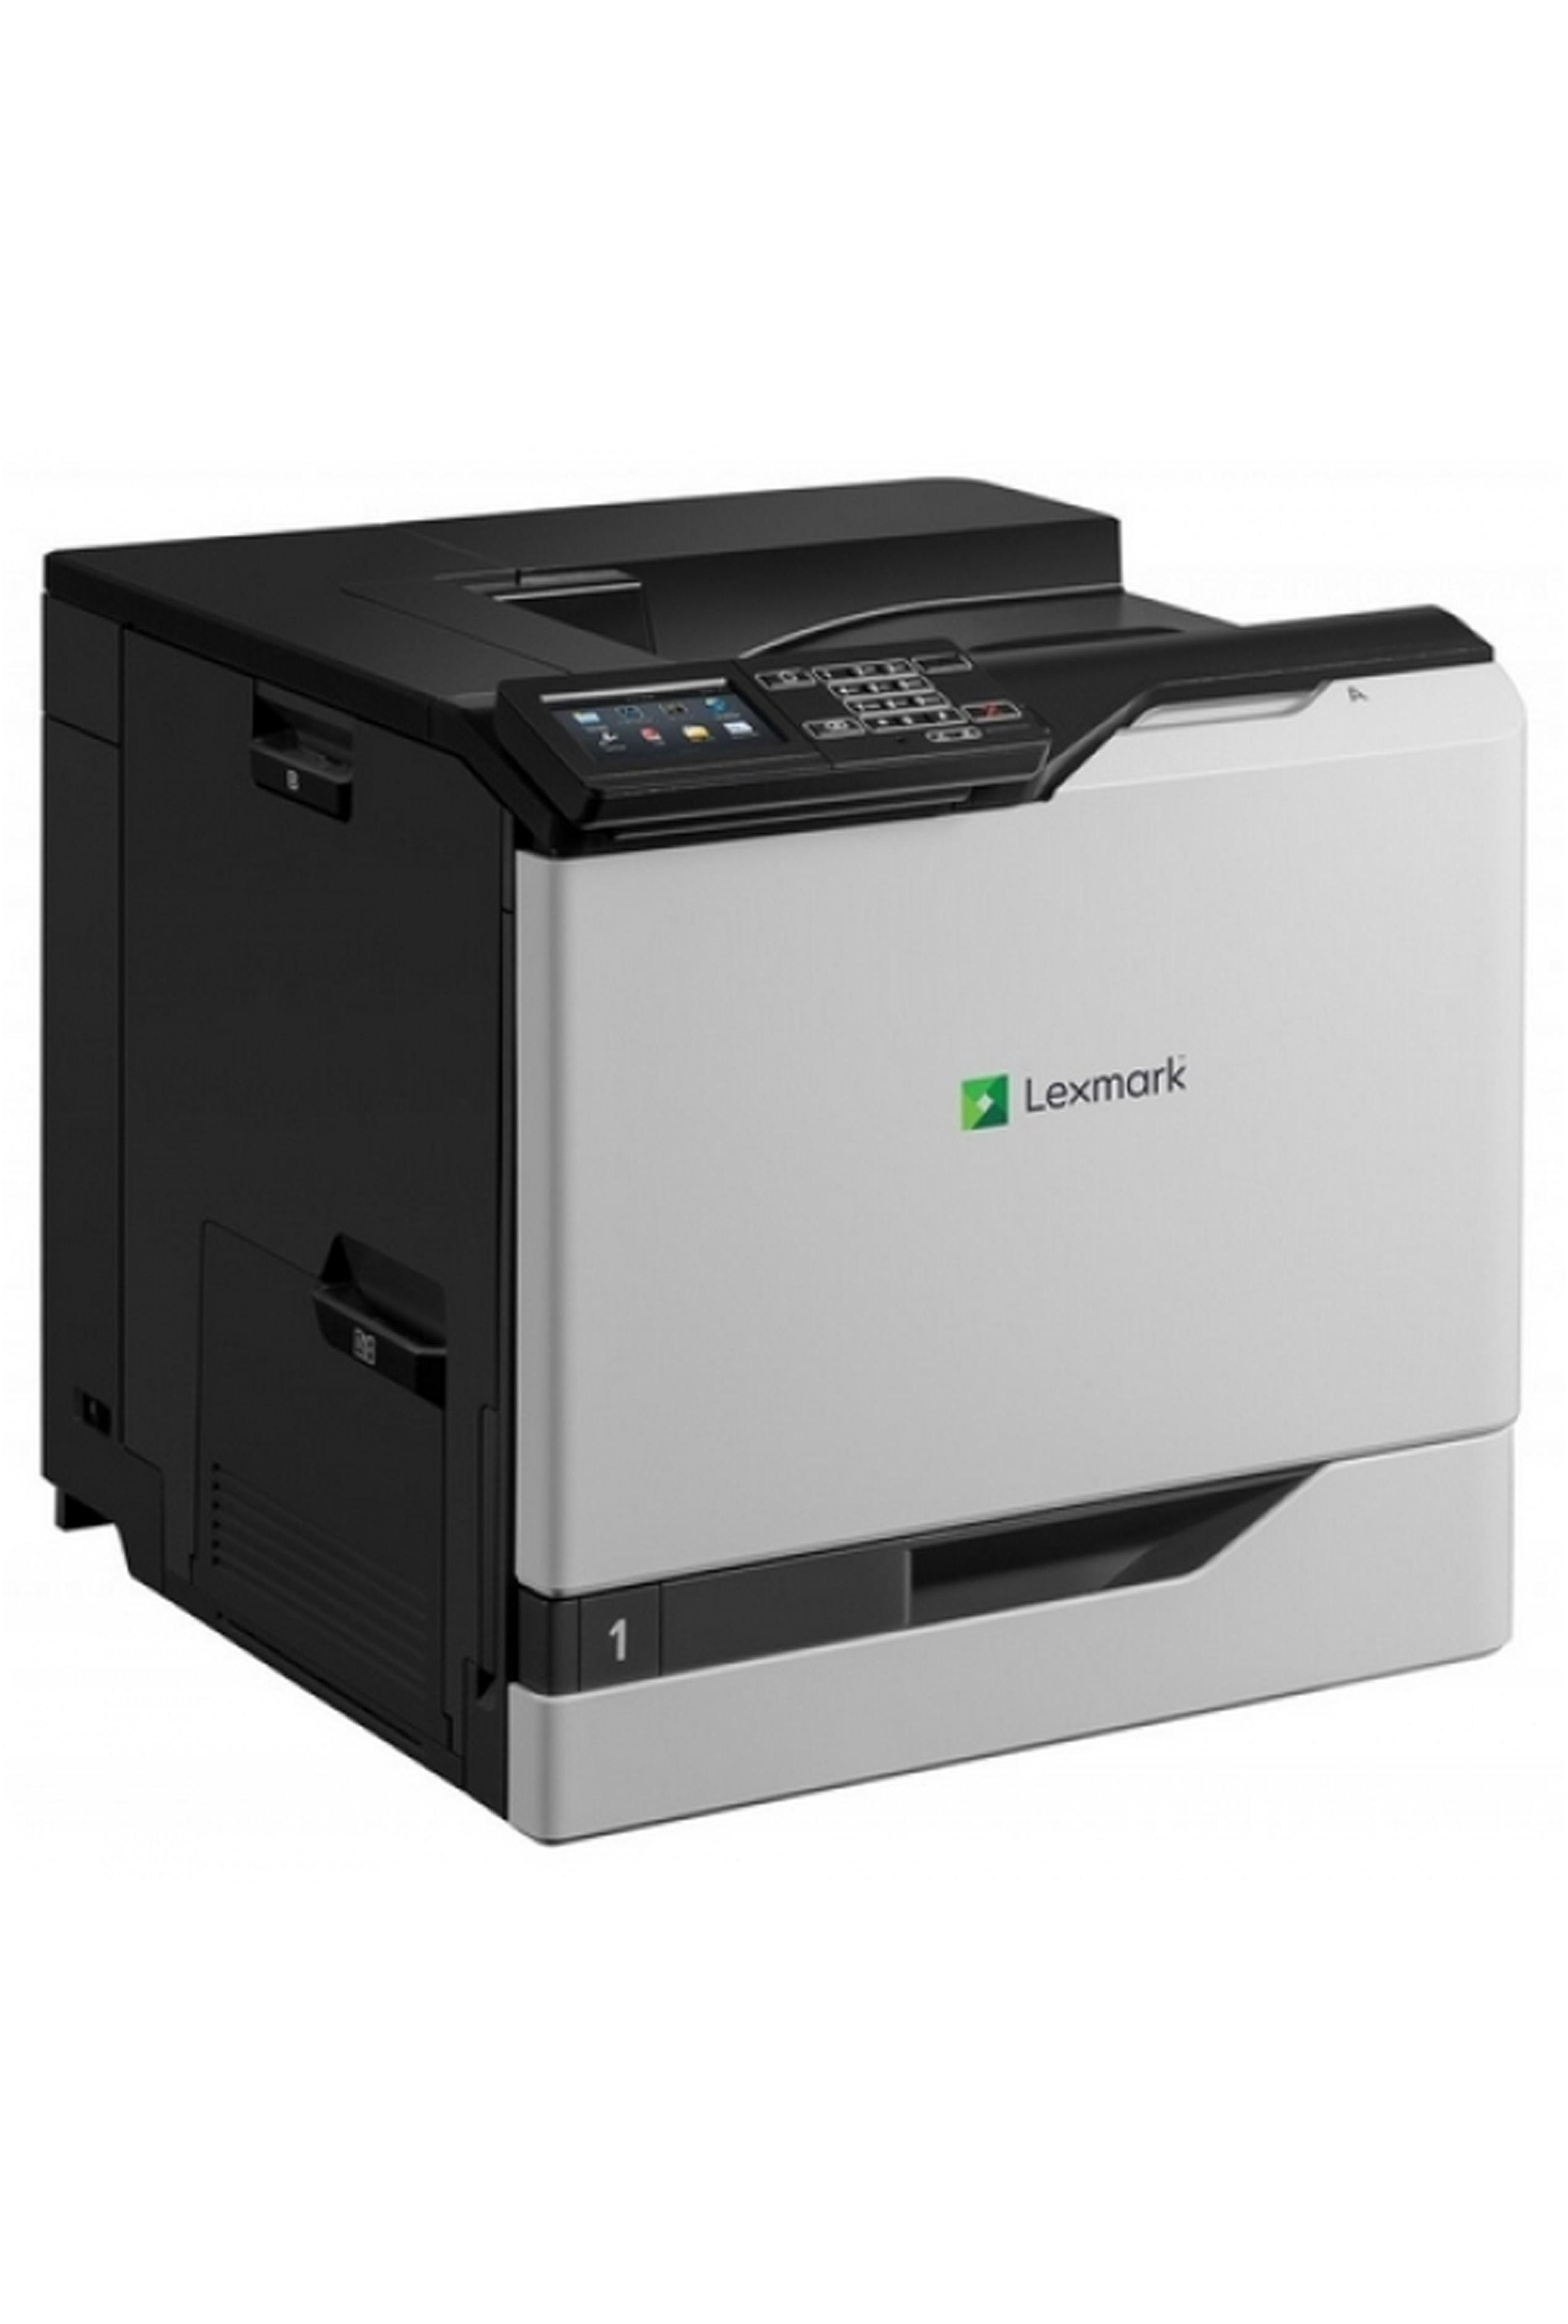 Lexmark CS820de Laser Printer...